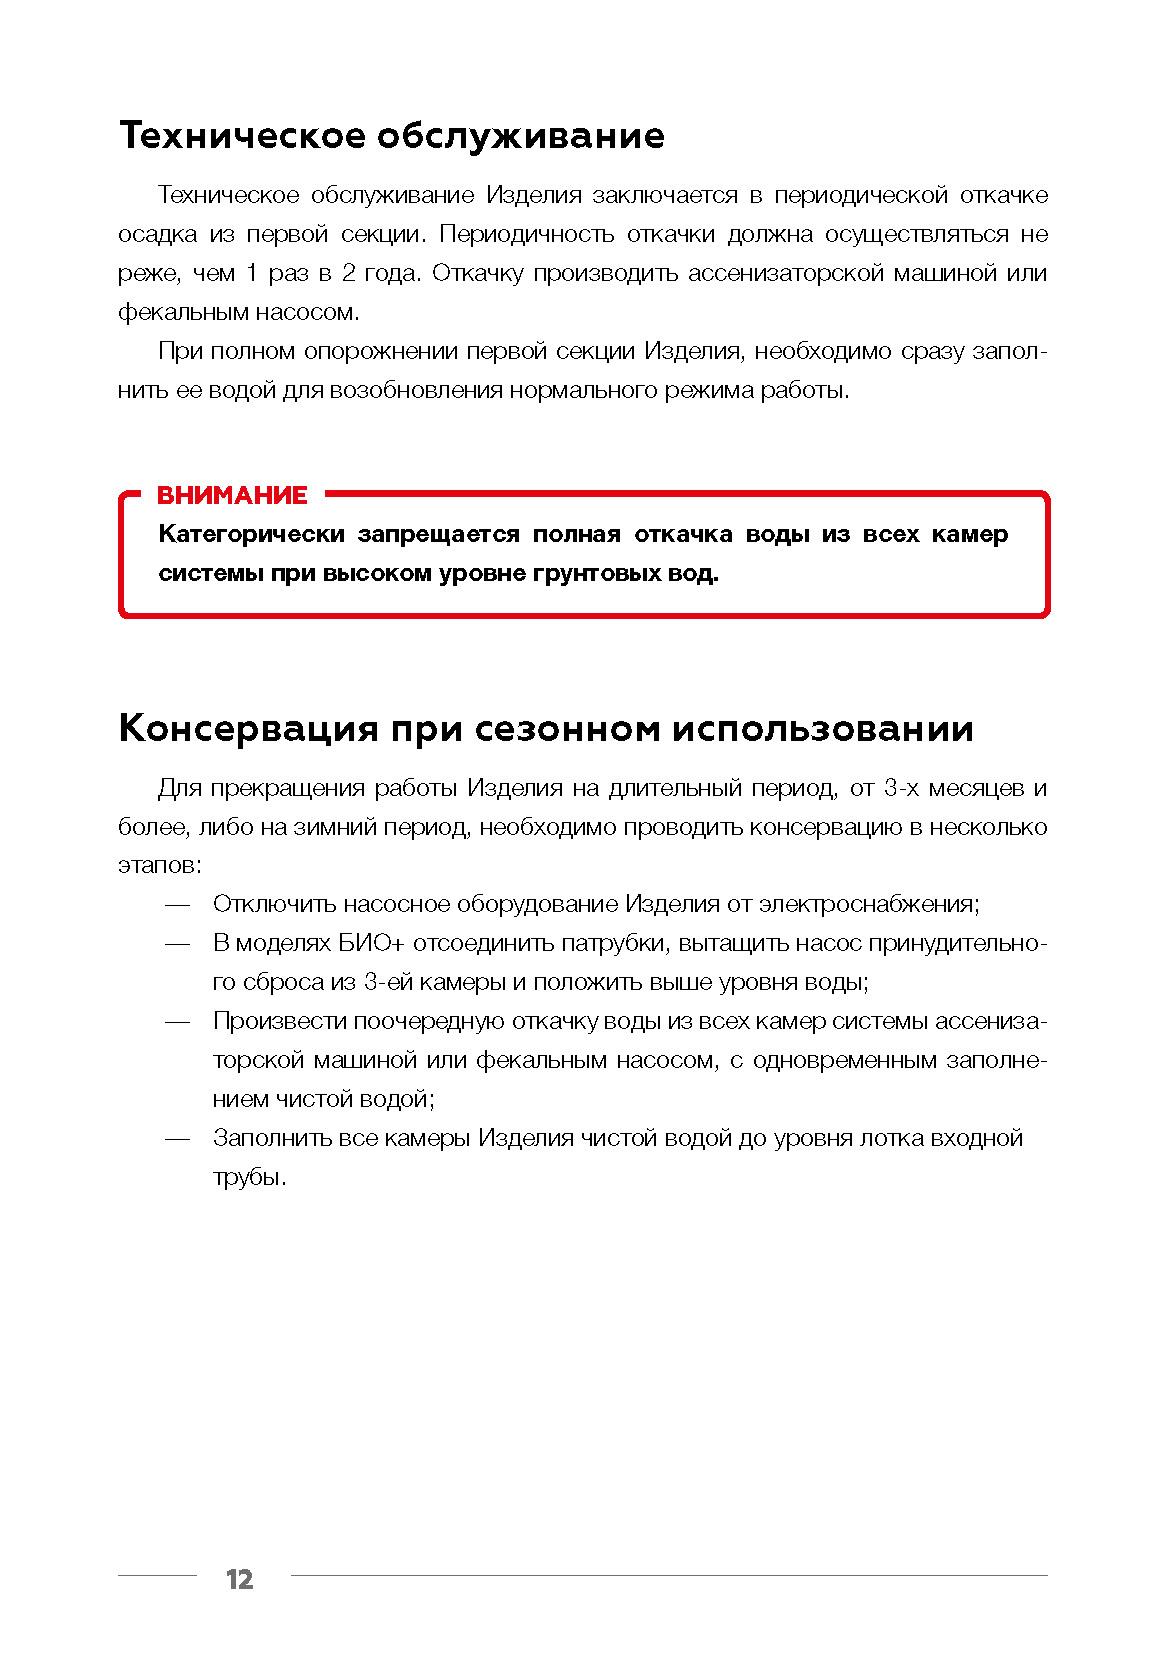 Технический паспорт Евролос Био_Страница_14